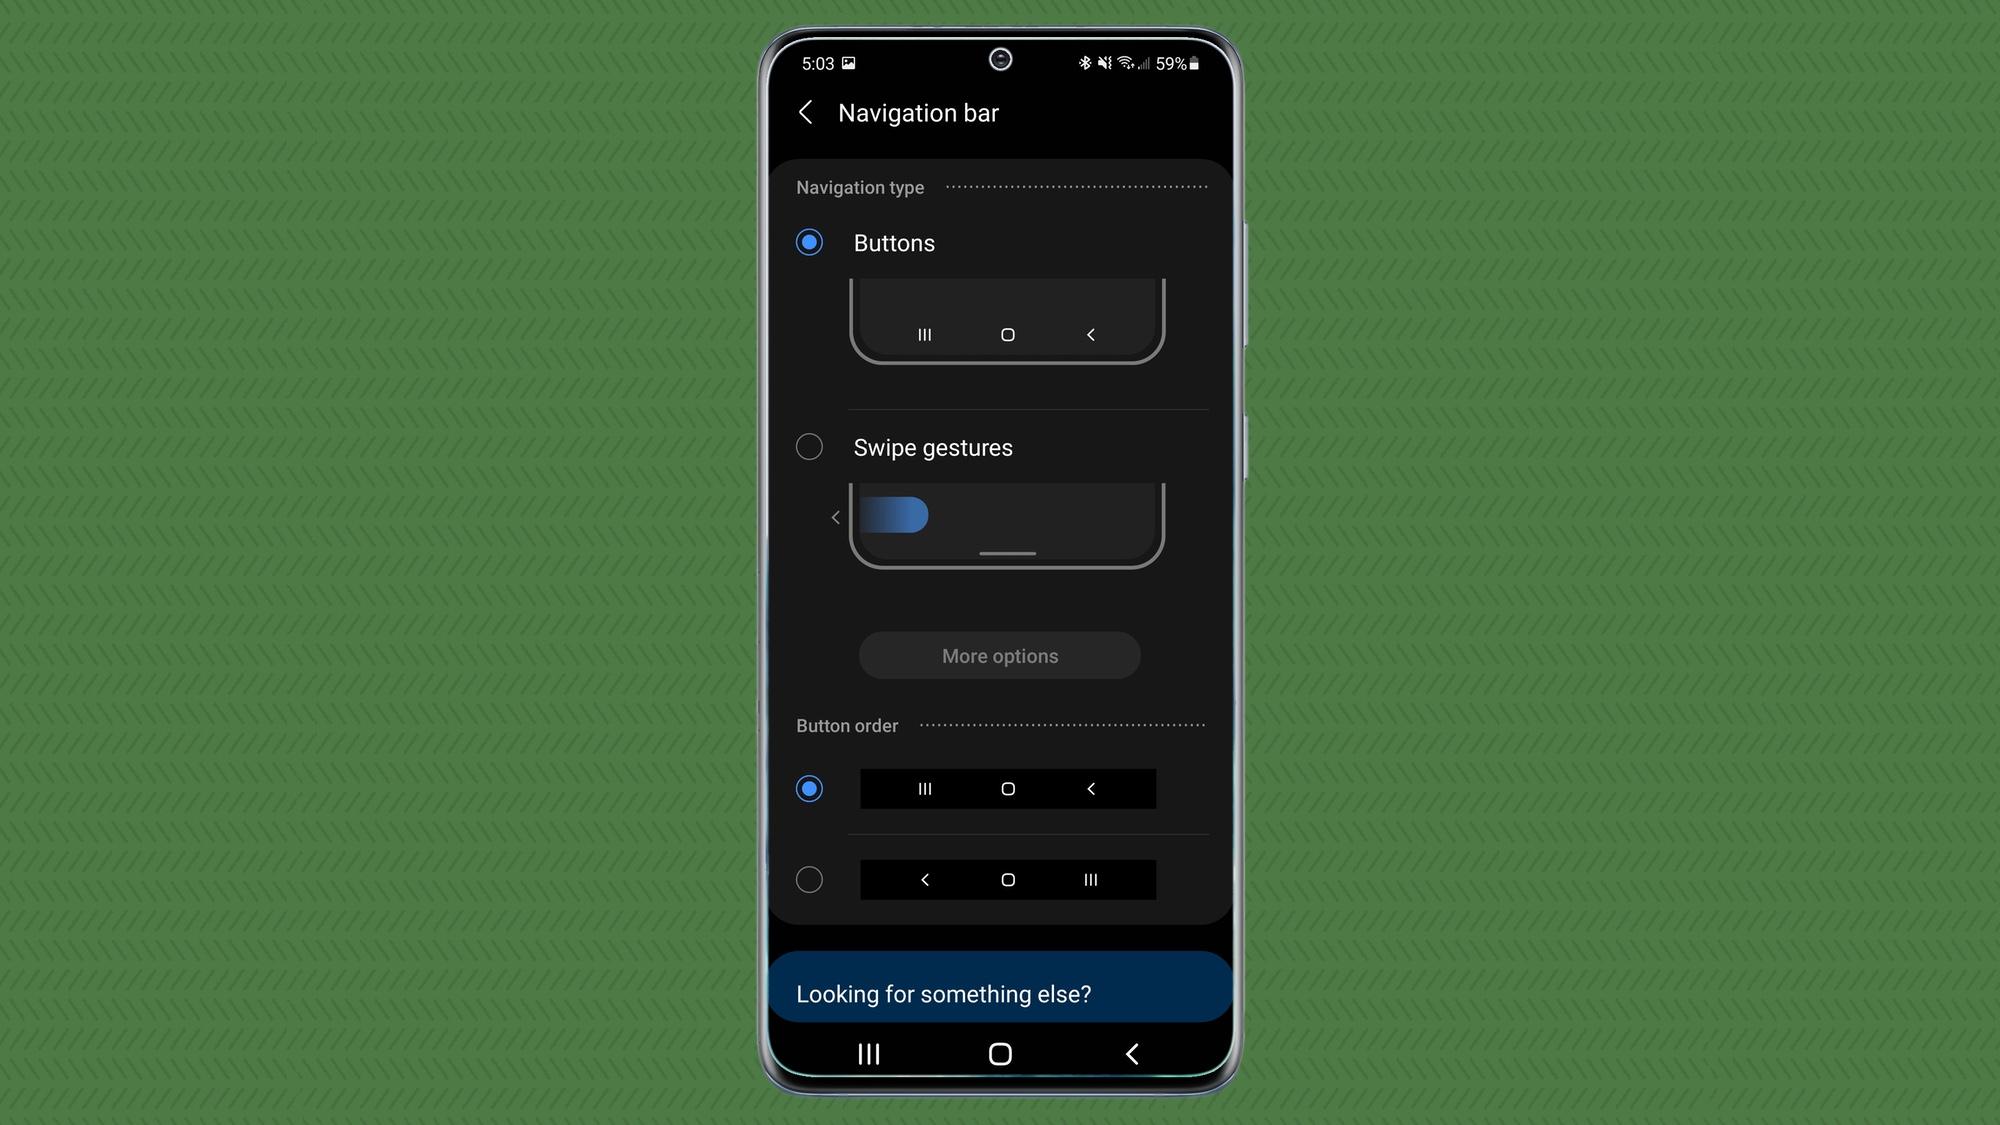 Функции Galaxy s21 для включения и отключения